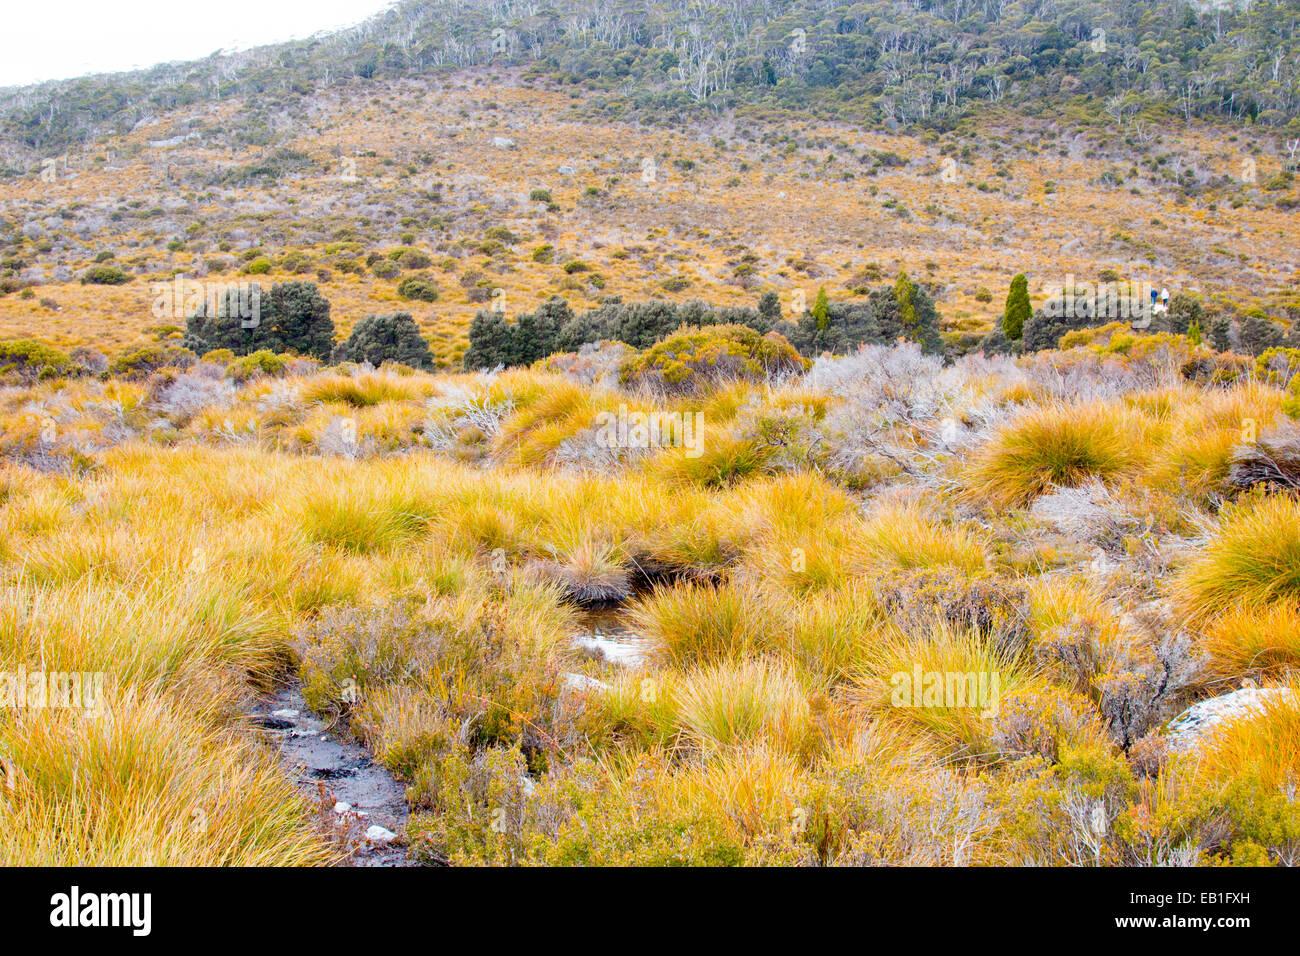 landscape in cradle mountain national park near dove lake,tasmania,australia - Stock Image